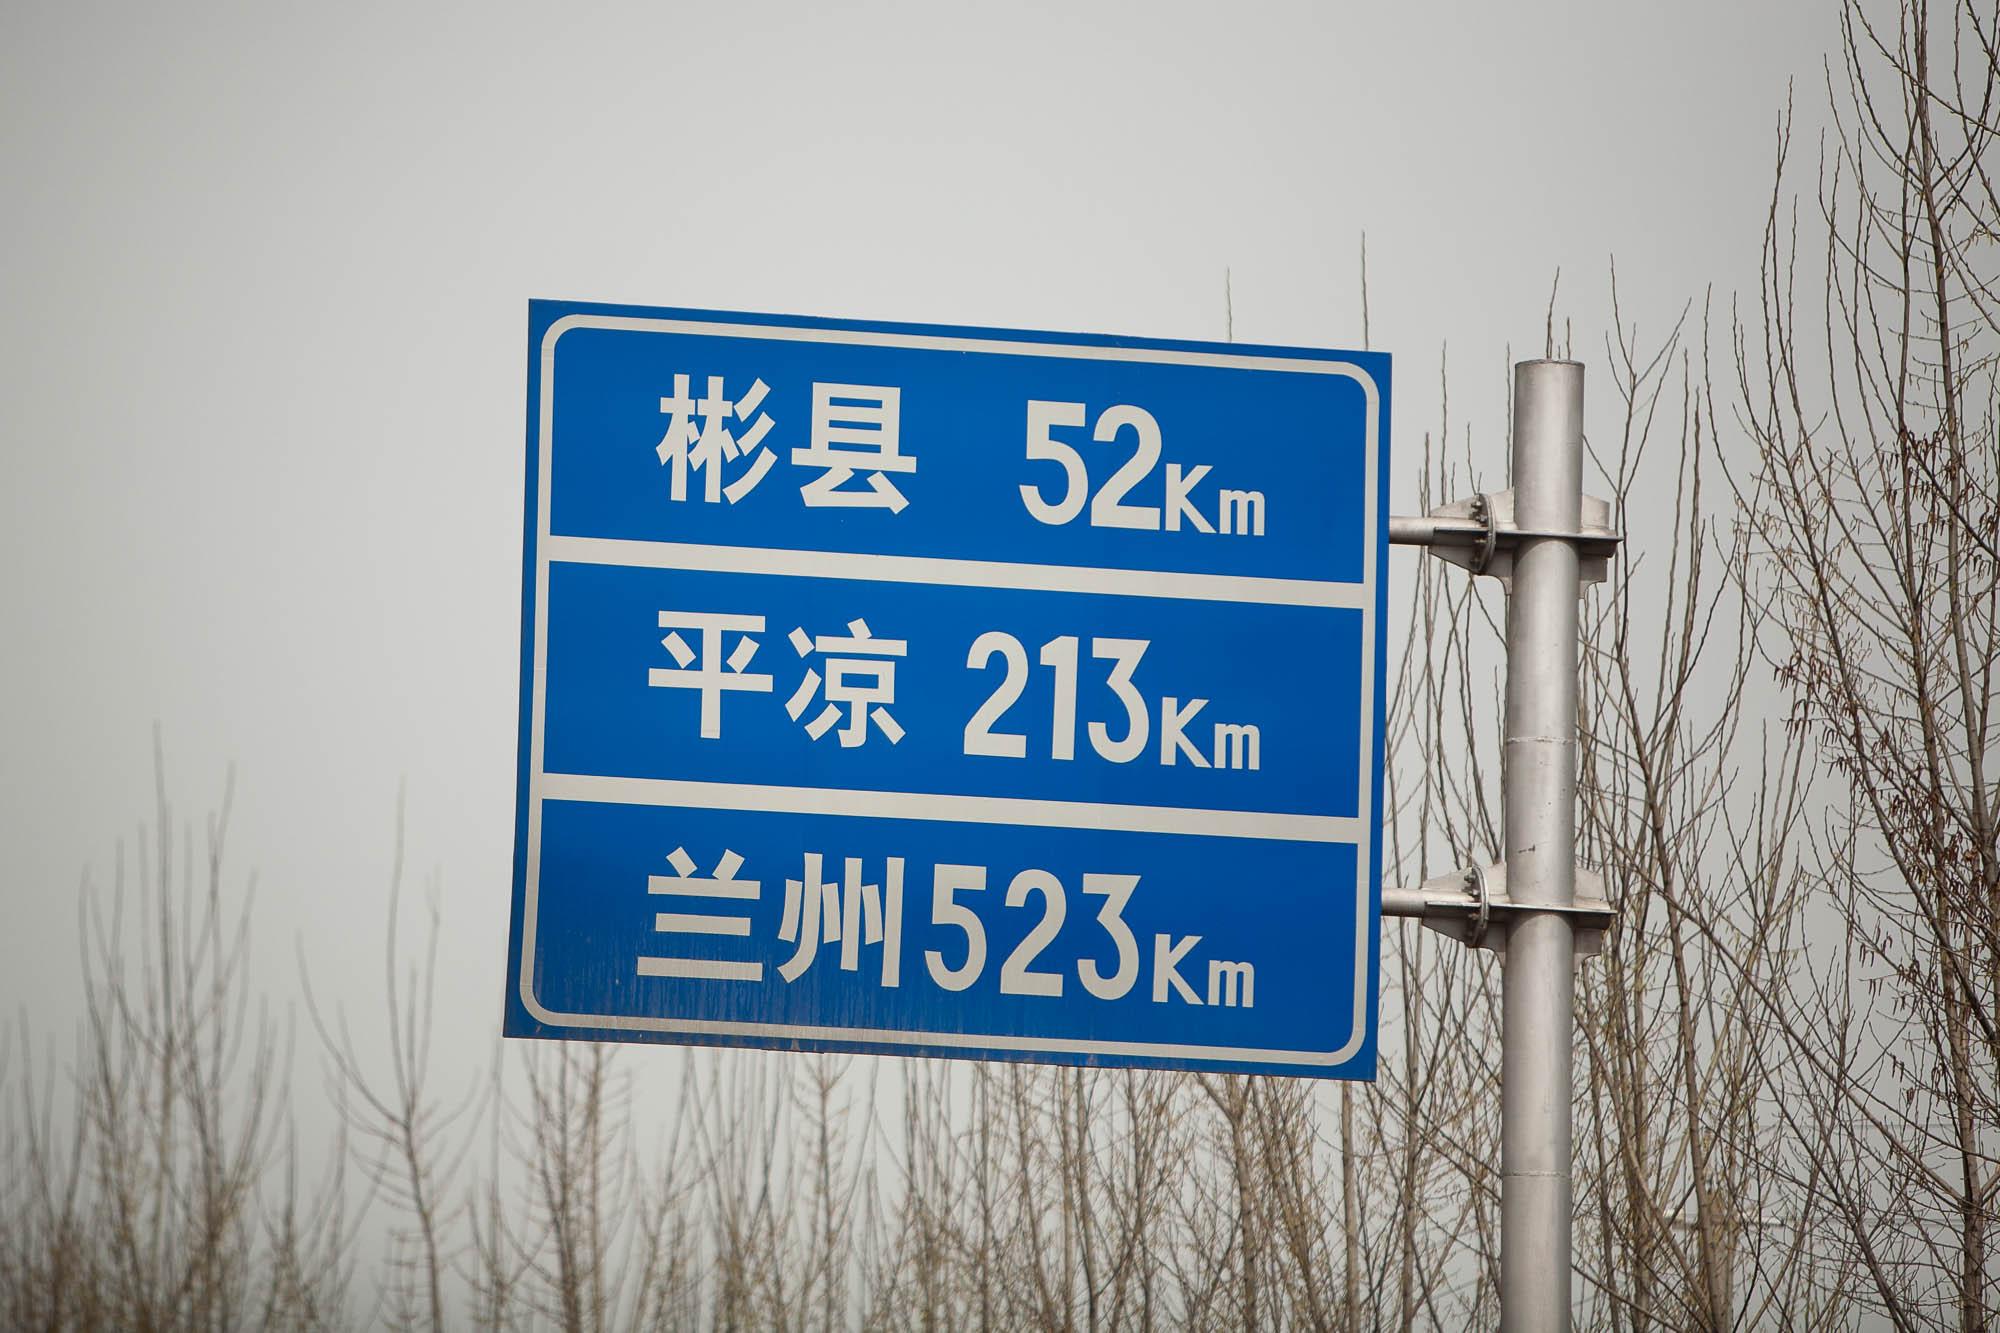 Binxian 52km